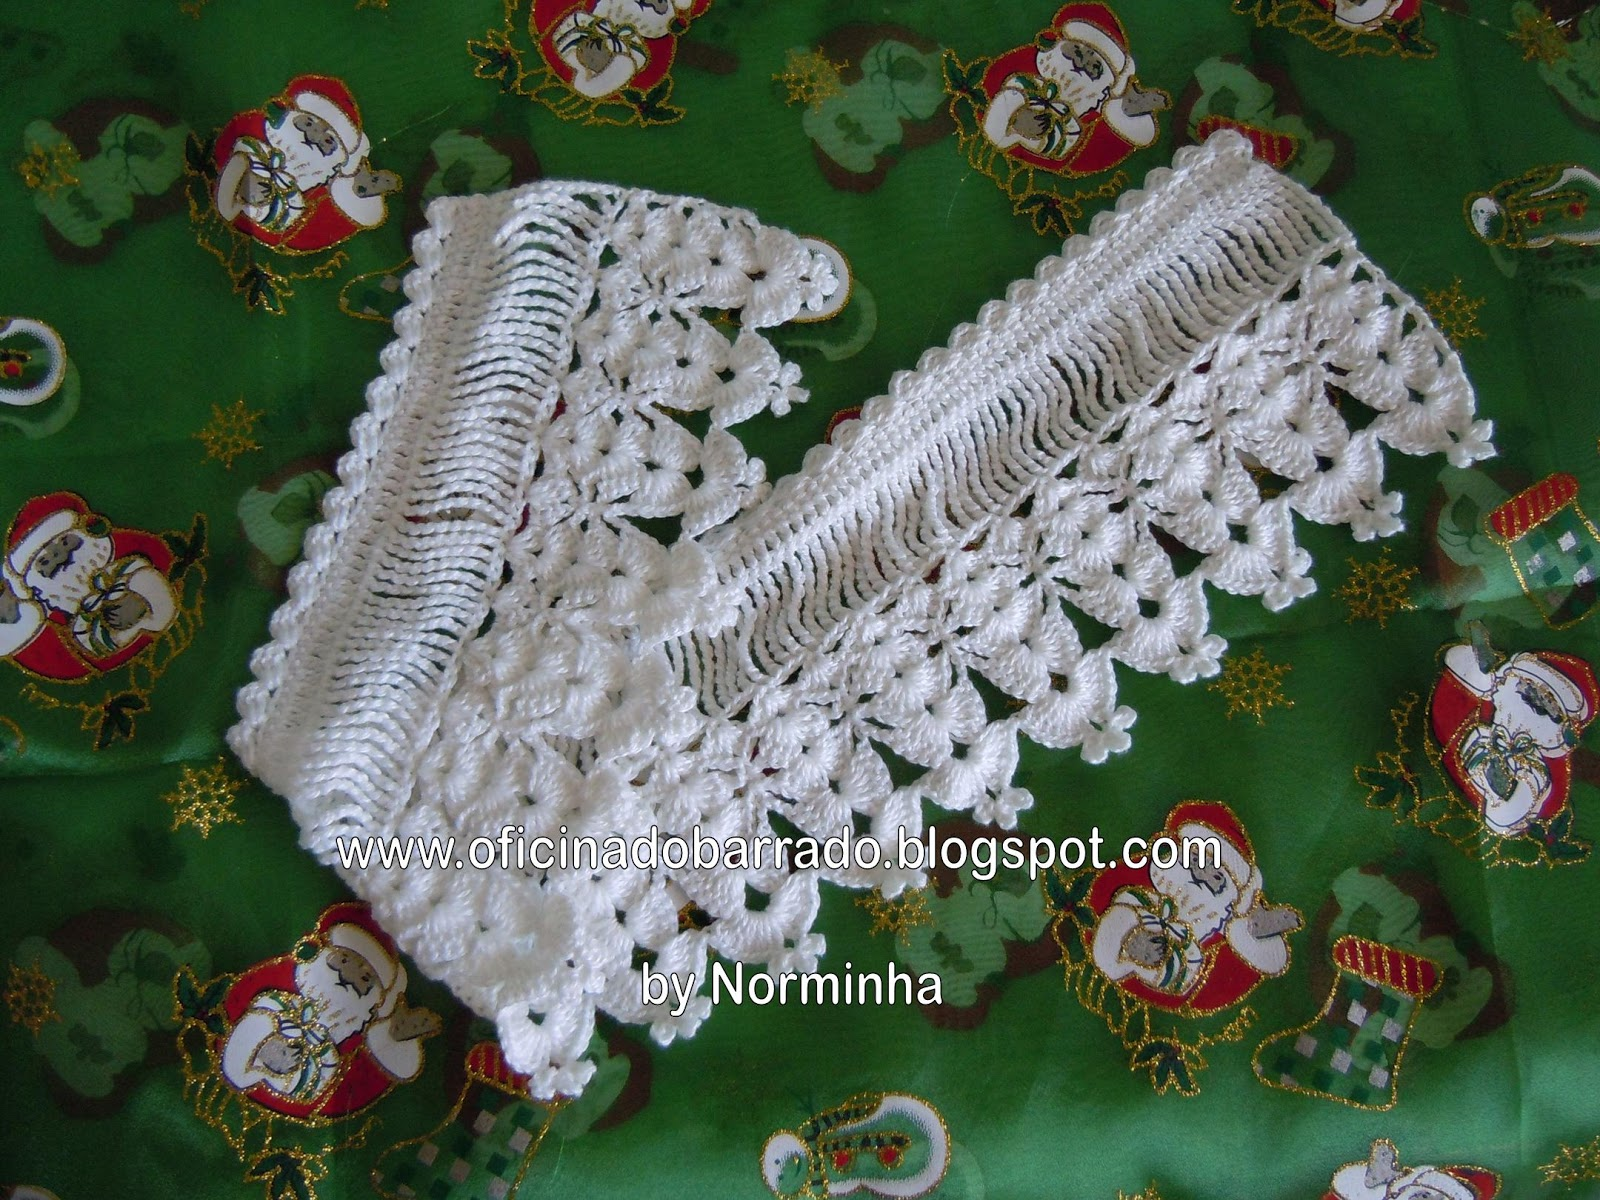 http://3.bp.blogspot.com/-jpxp0Y-8AXE/UHxYzJ-79GI/AAAAAAAAKNQ/-ej6_f6hV0s/s1600/NATALbarrPerolImagem1.jpg